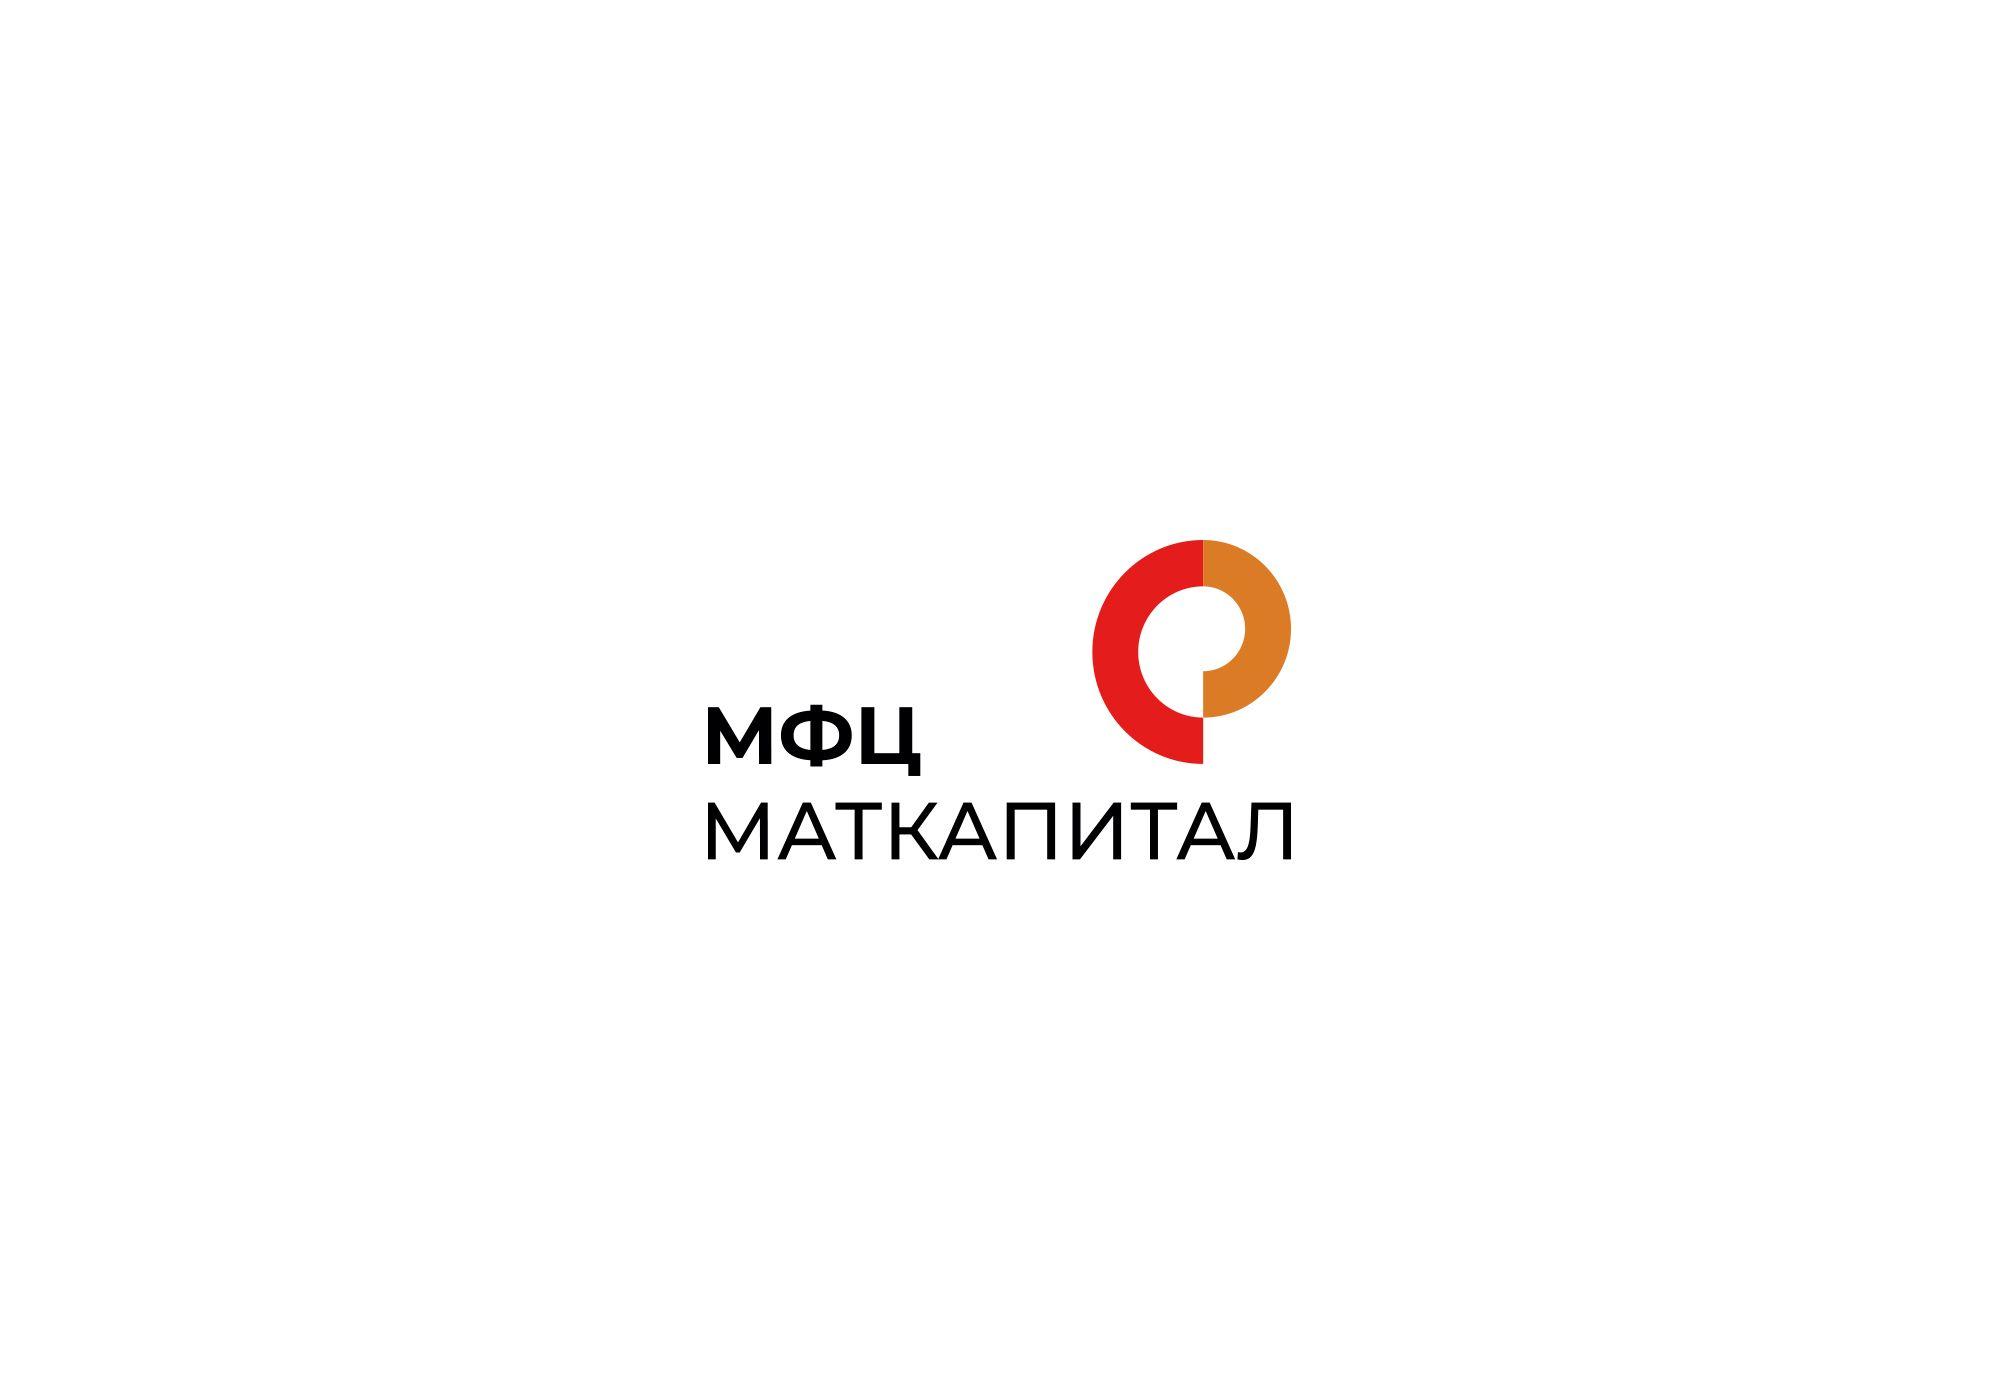 Логотип для МФЦ МАТКАПИТАЛ - дизайнер Ninpo